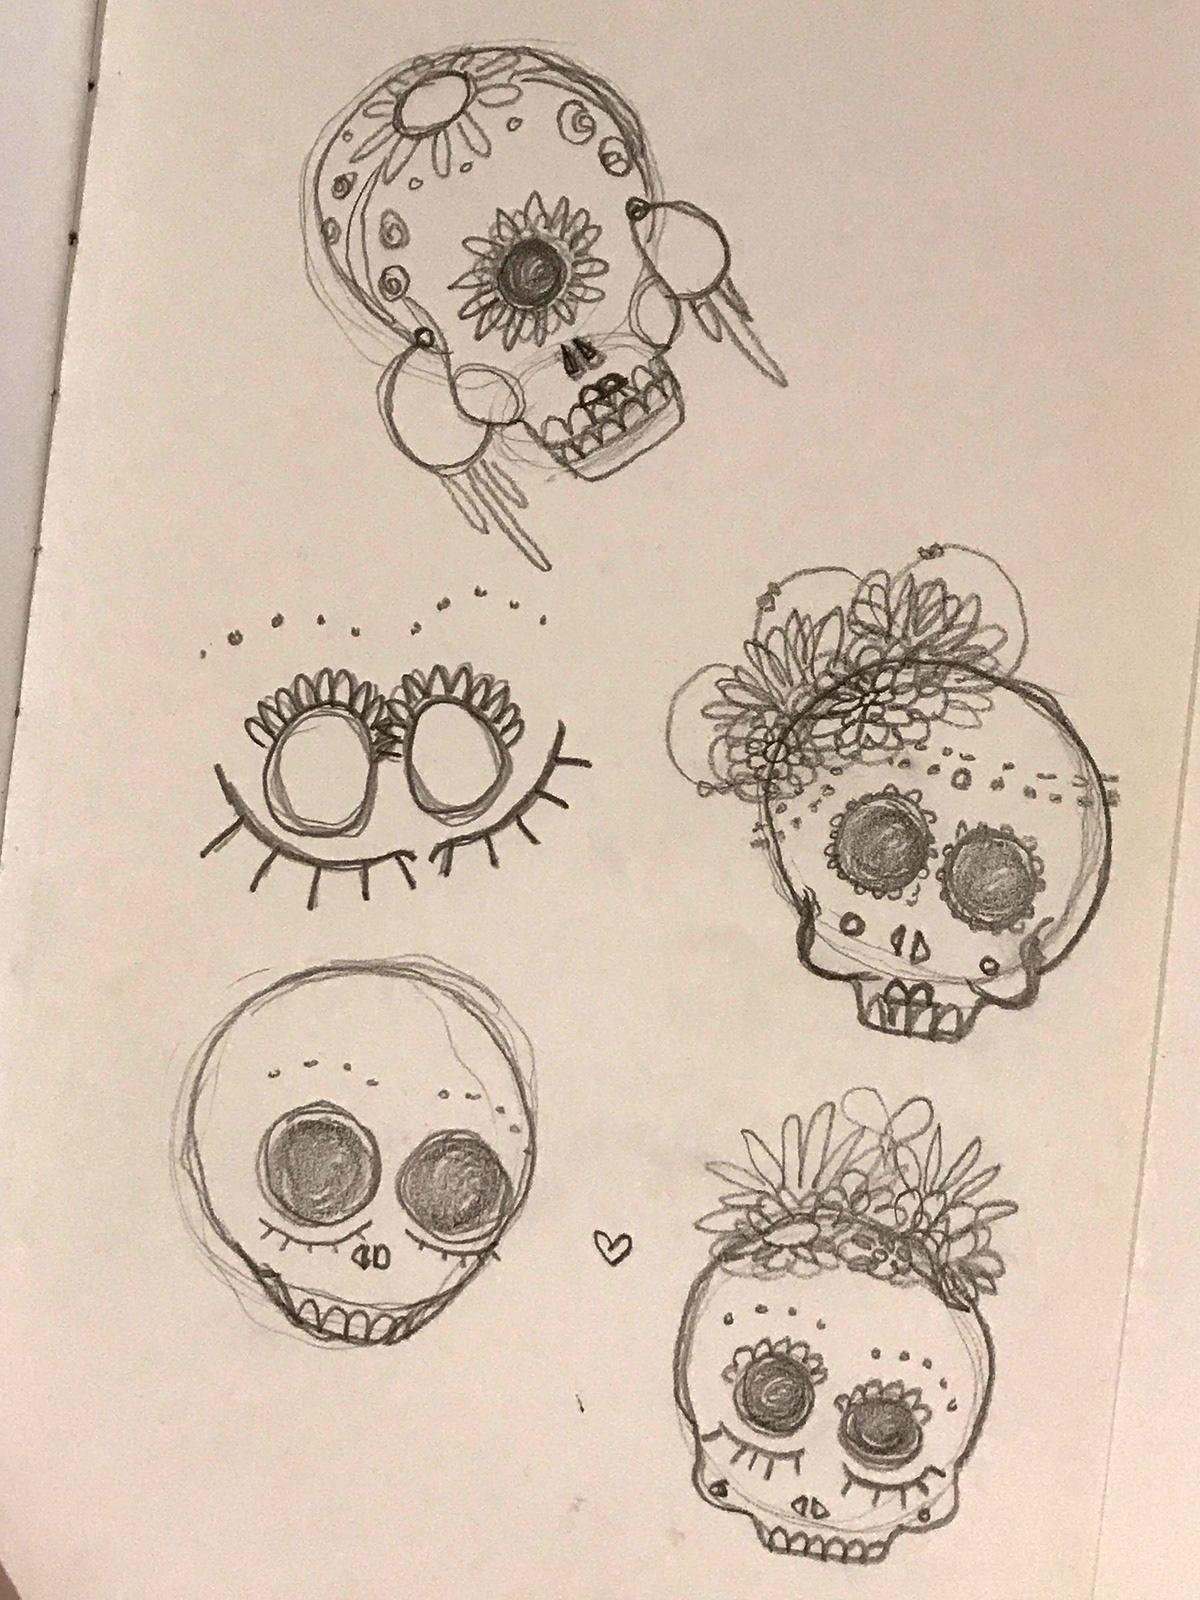 stephanymarlen3 ink watercolor portrait time face women sketch color mexico